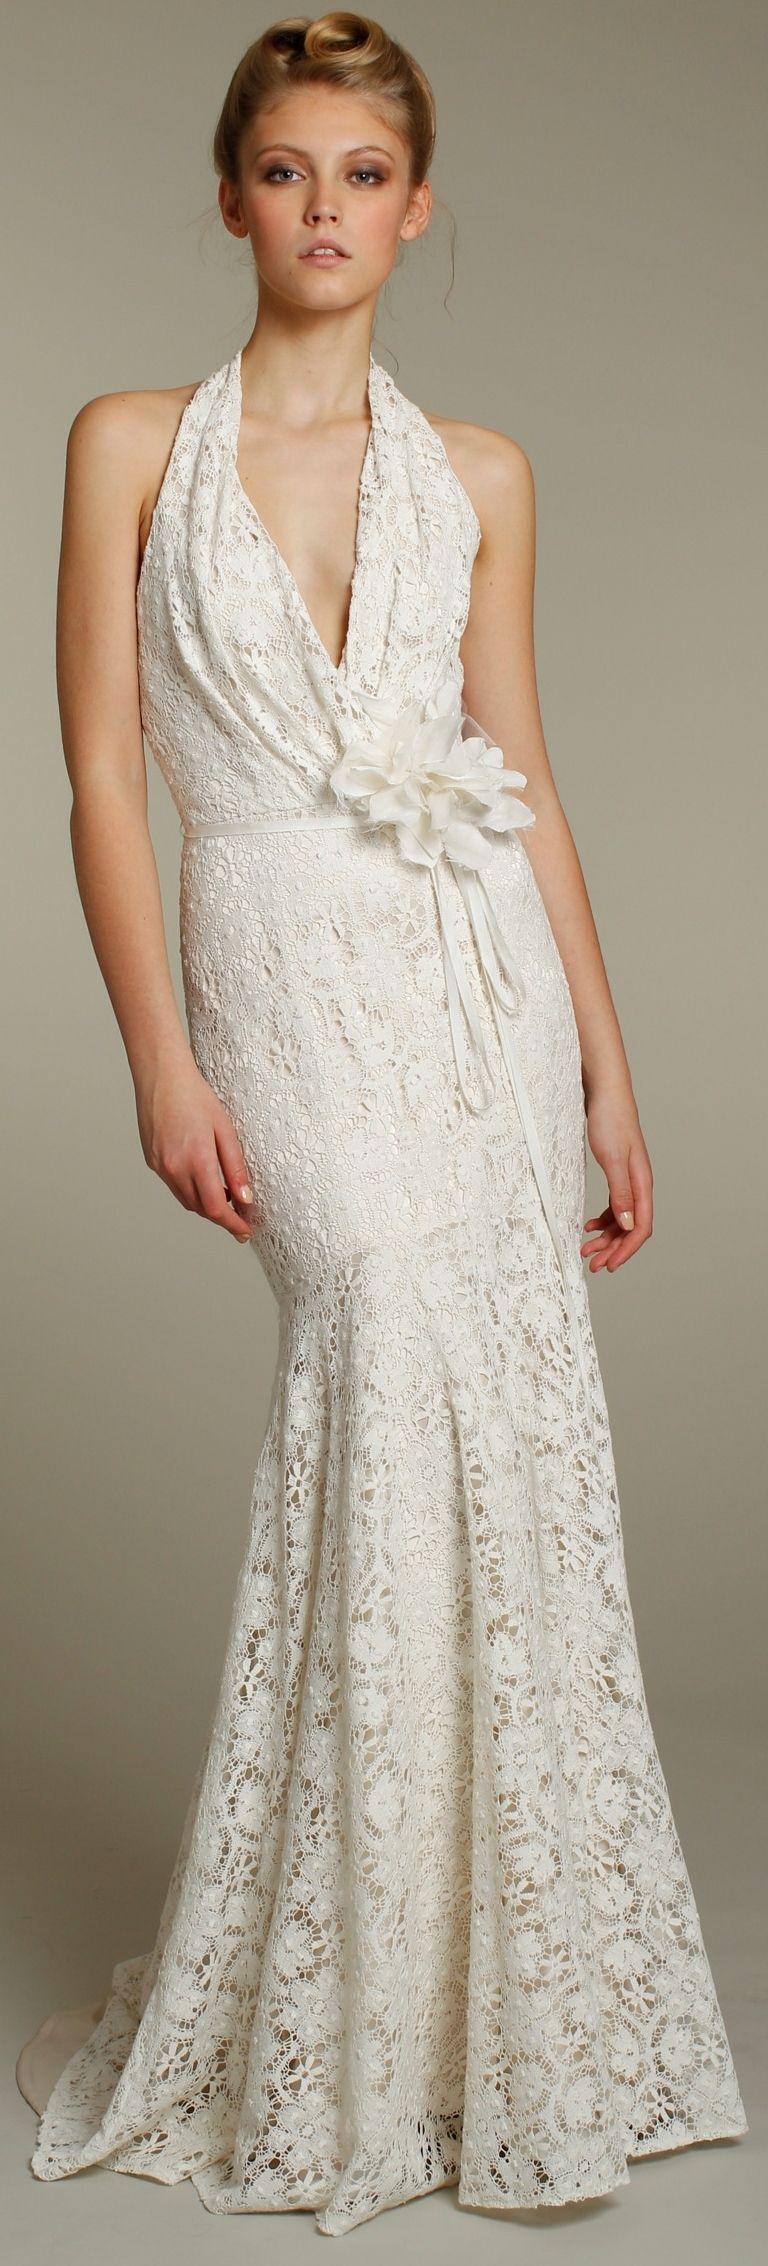 Romantic lace mermaid halter wedding dress with embellished bridal